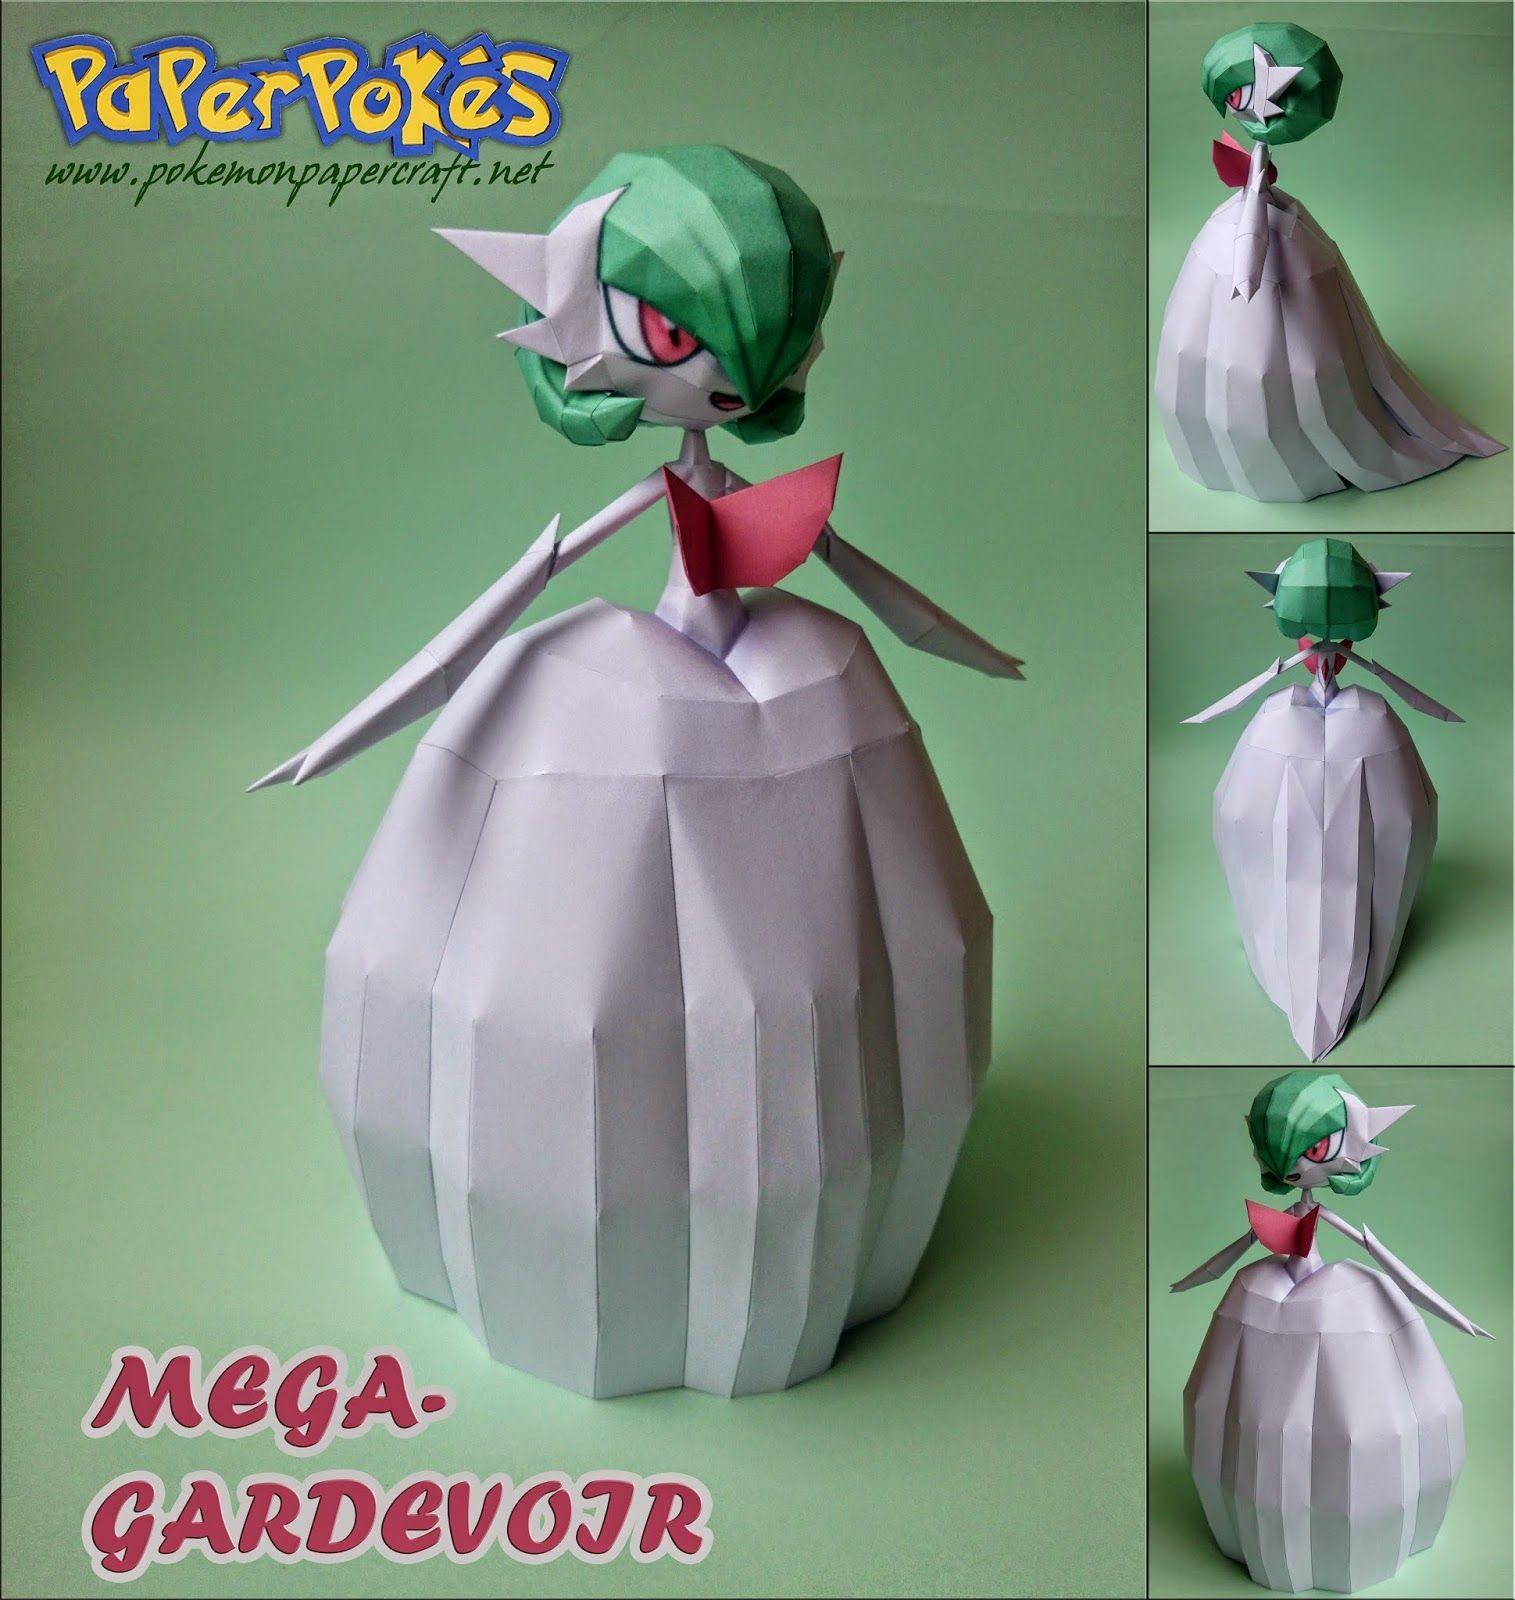 Papercraft Figures Paperpokés Pokémon Papercrafts Mega Gardevoir